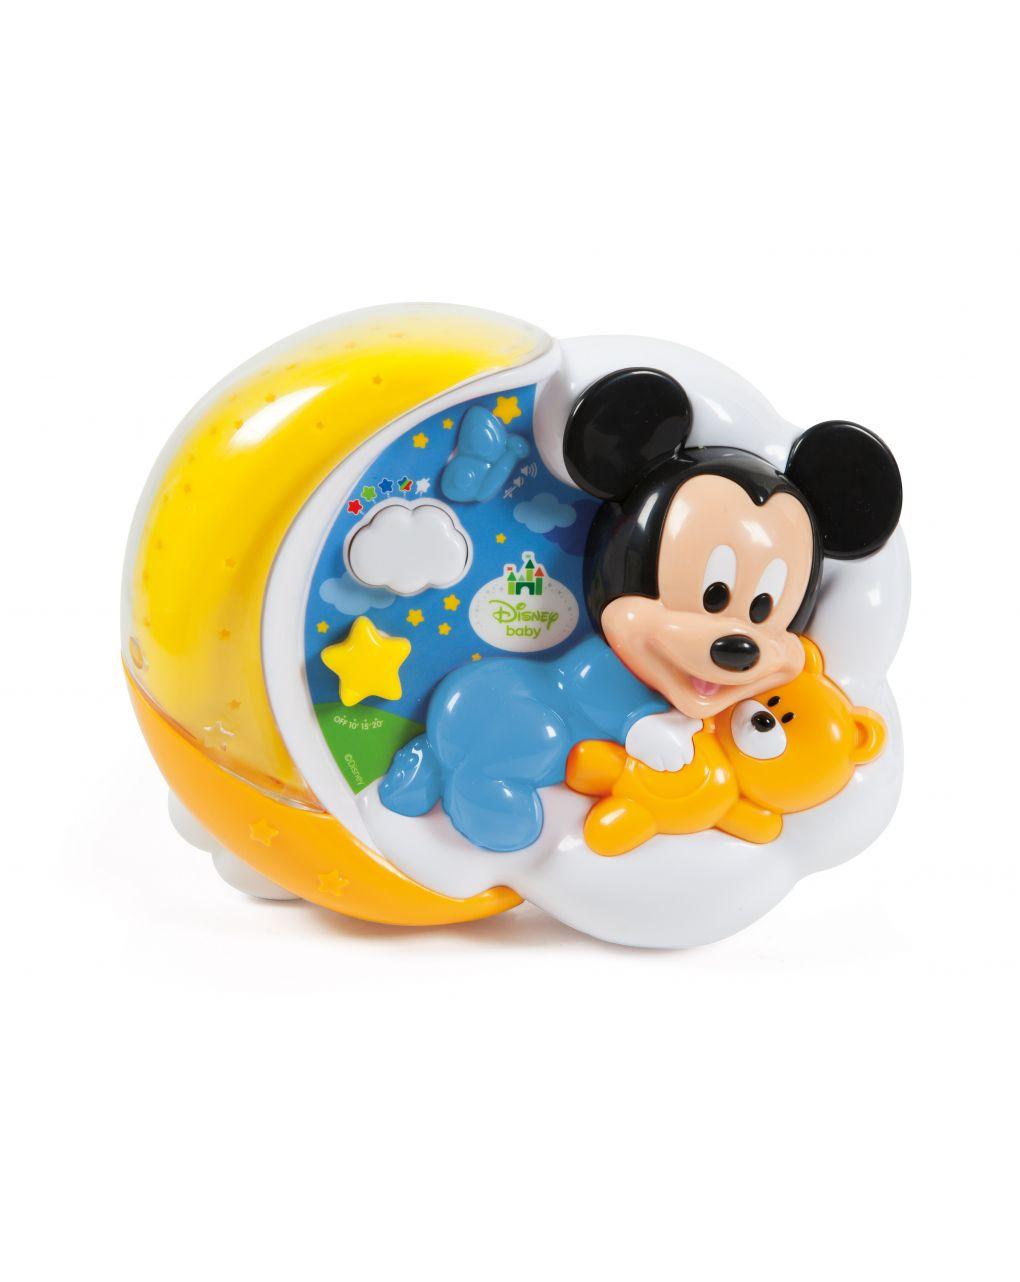 Disney baby - baby mickey proiettore magiche stelle - Clementoni